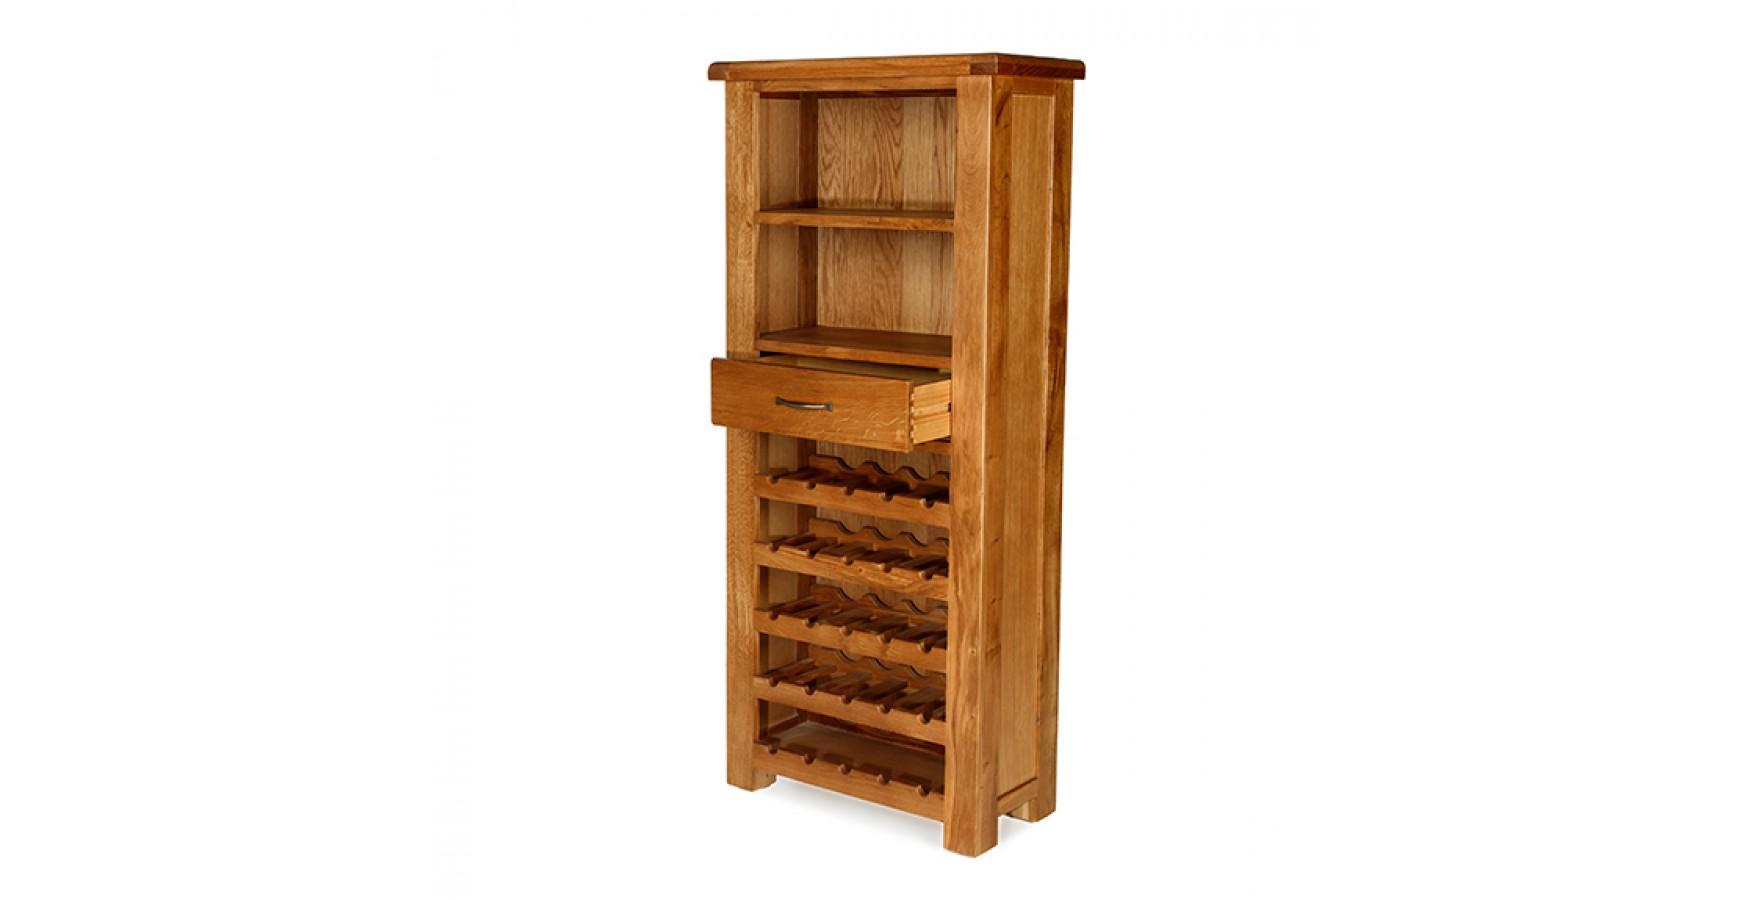 Emsworth Oak Tall Wine Rack Unit - Lifestyle Furniture UK